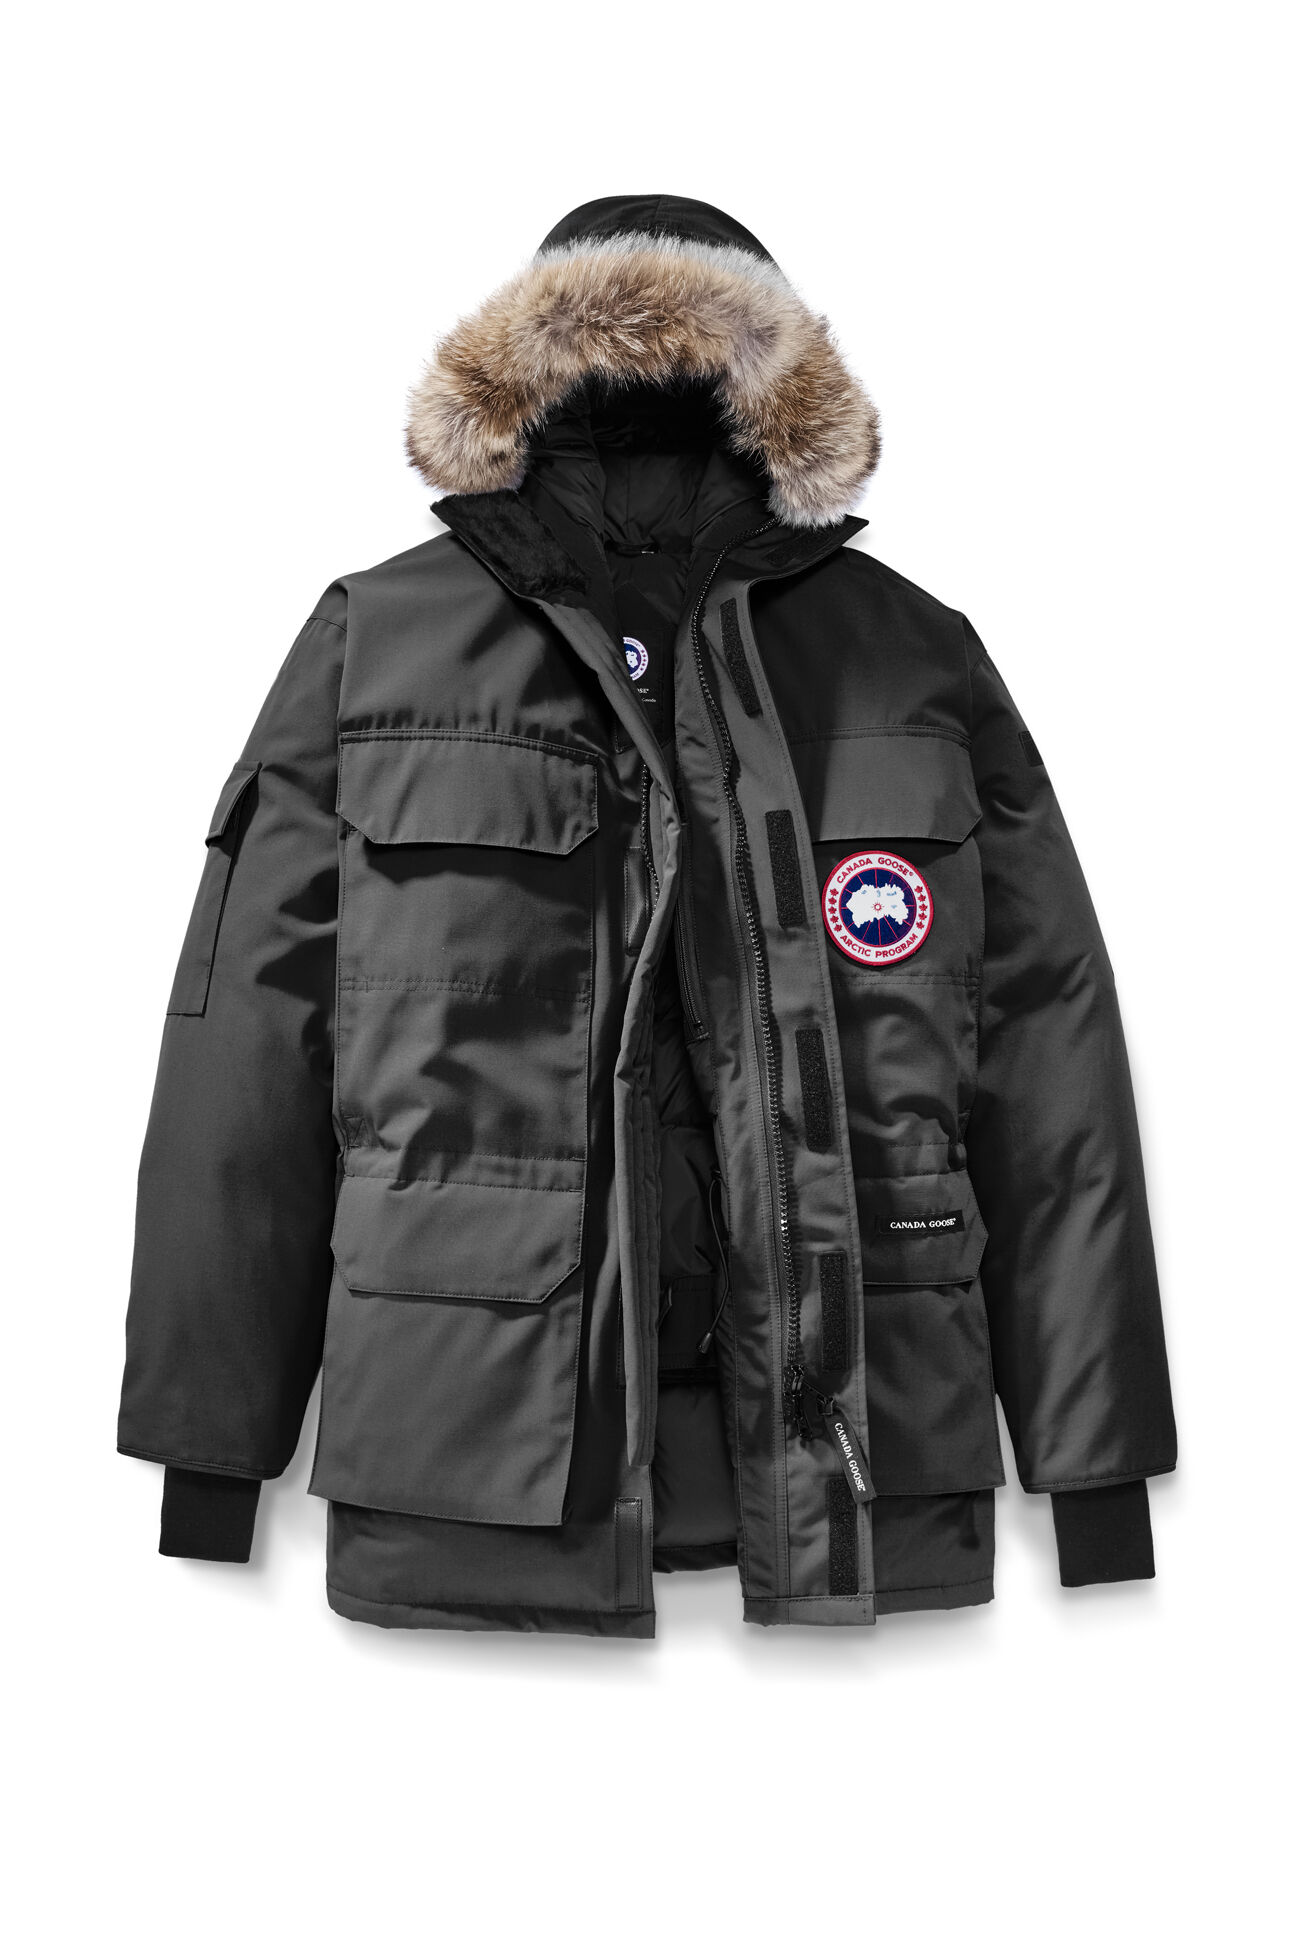 canada goose jacket redflagdeals